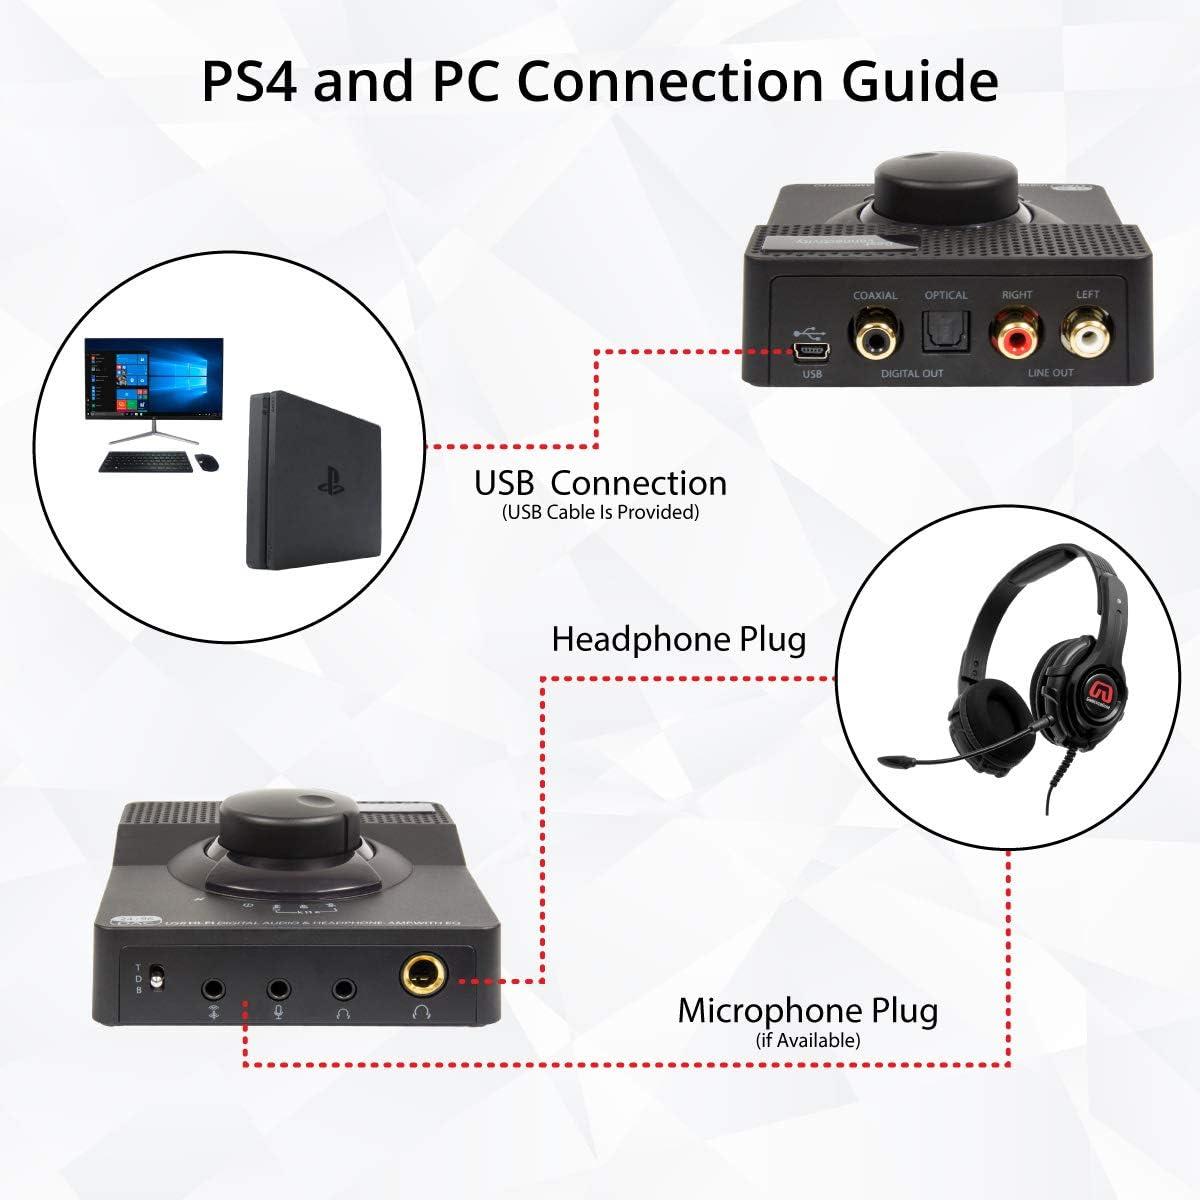 Syba Sonic Amplificador de Auriculares est/éreo 2 etapas, 96 KHz, USB DAC, Salida Digital//coaxial y Salida RCA